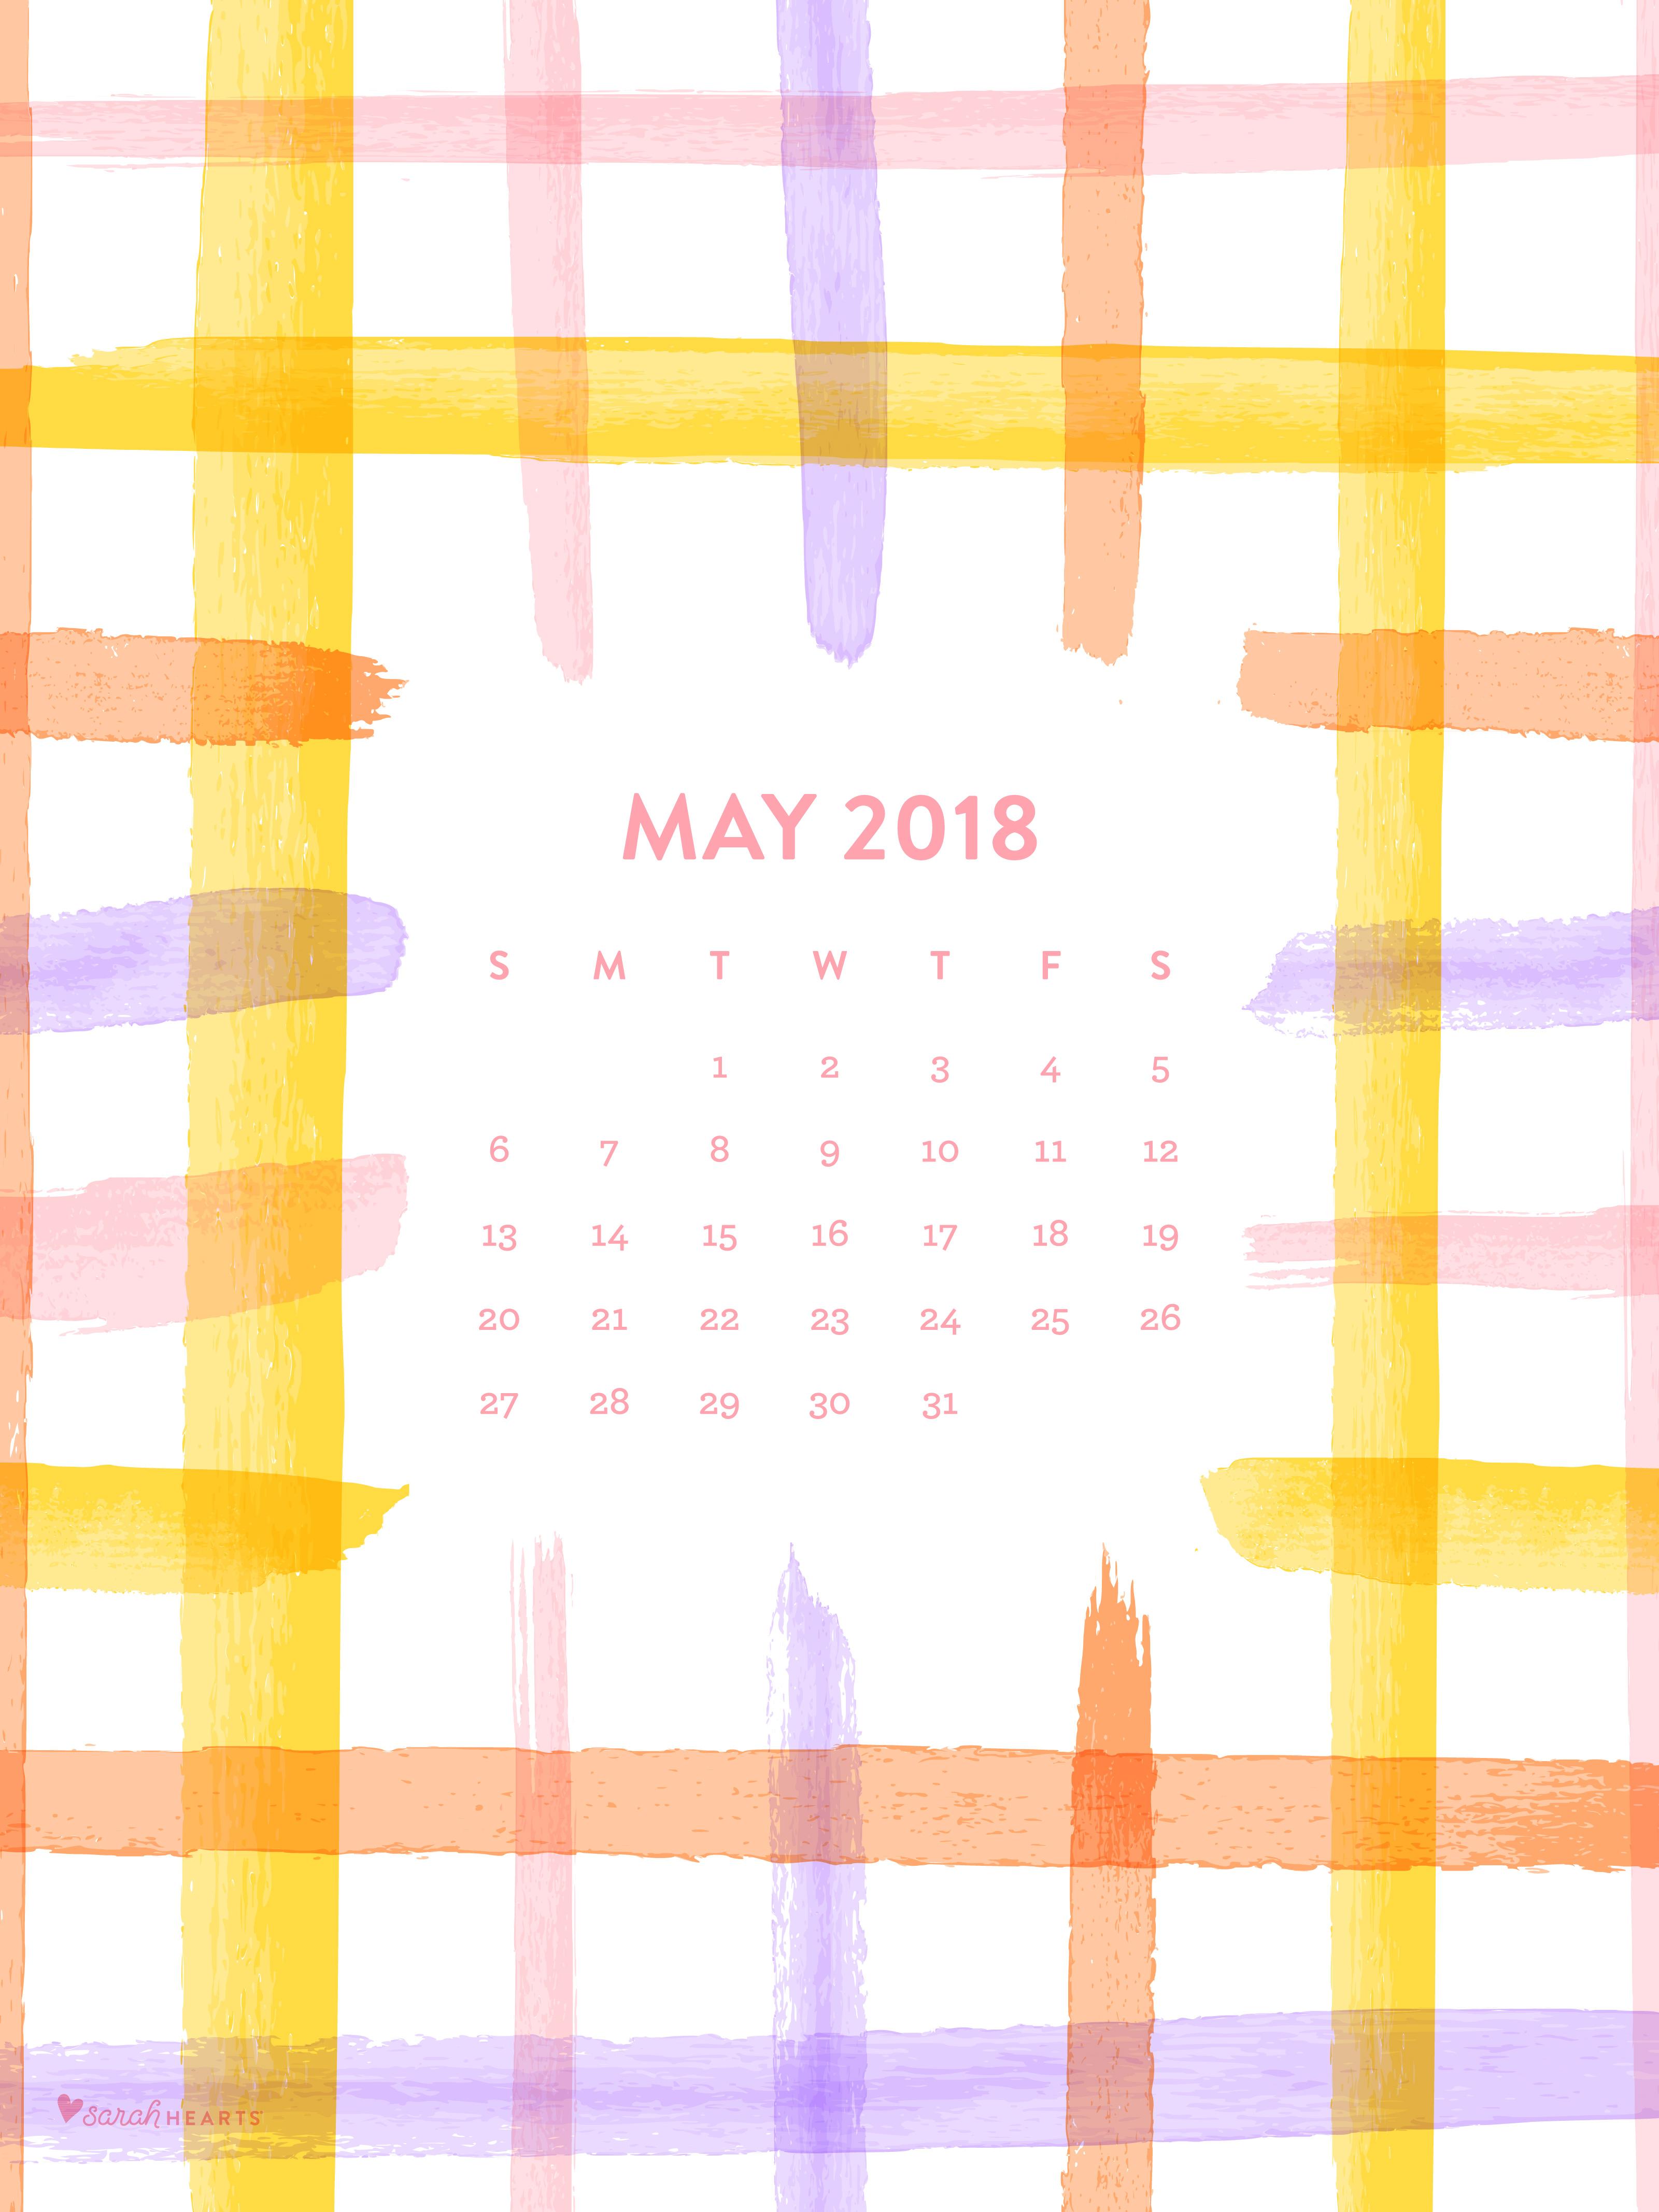 Calendar Wallpaper Ipad : May spring plaid calendar wallpaper sarah hearts